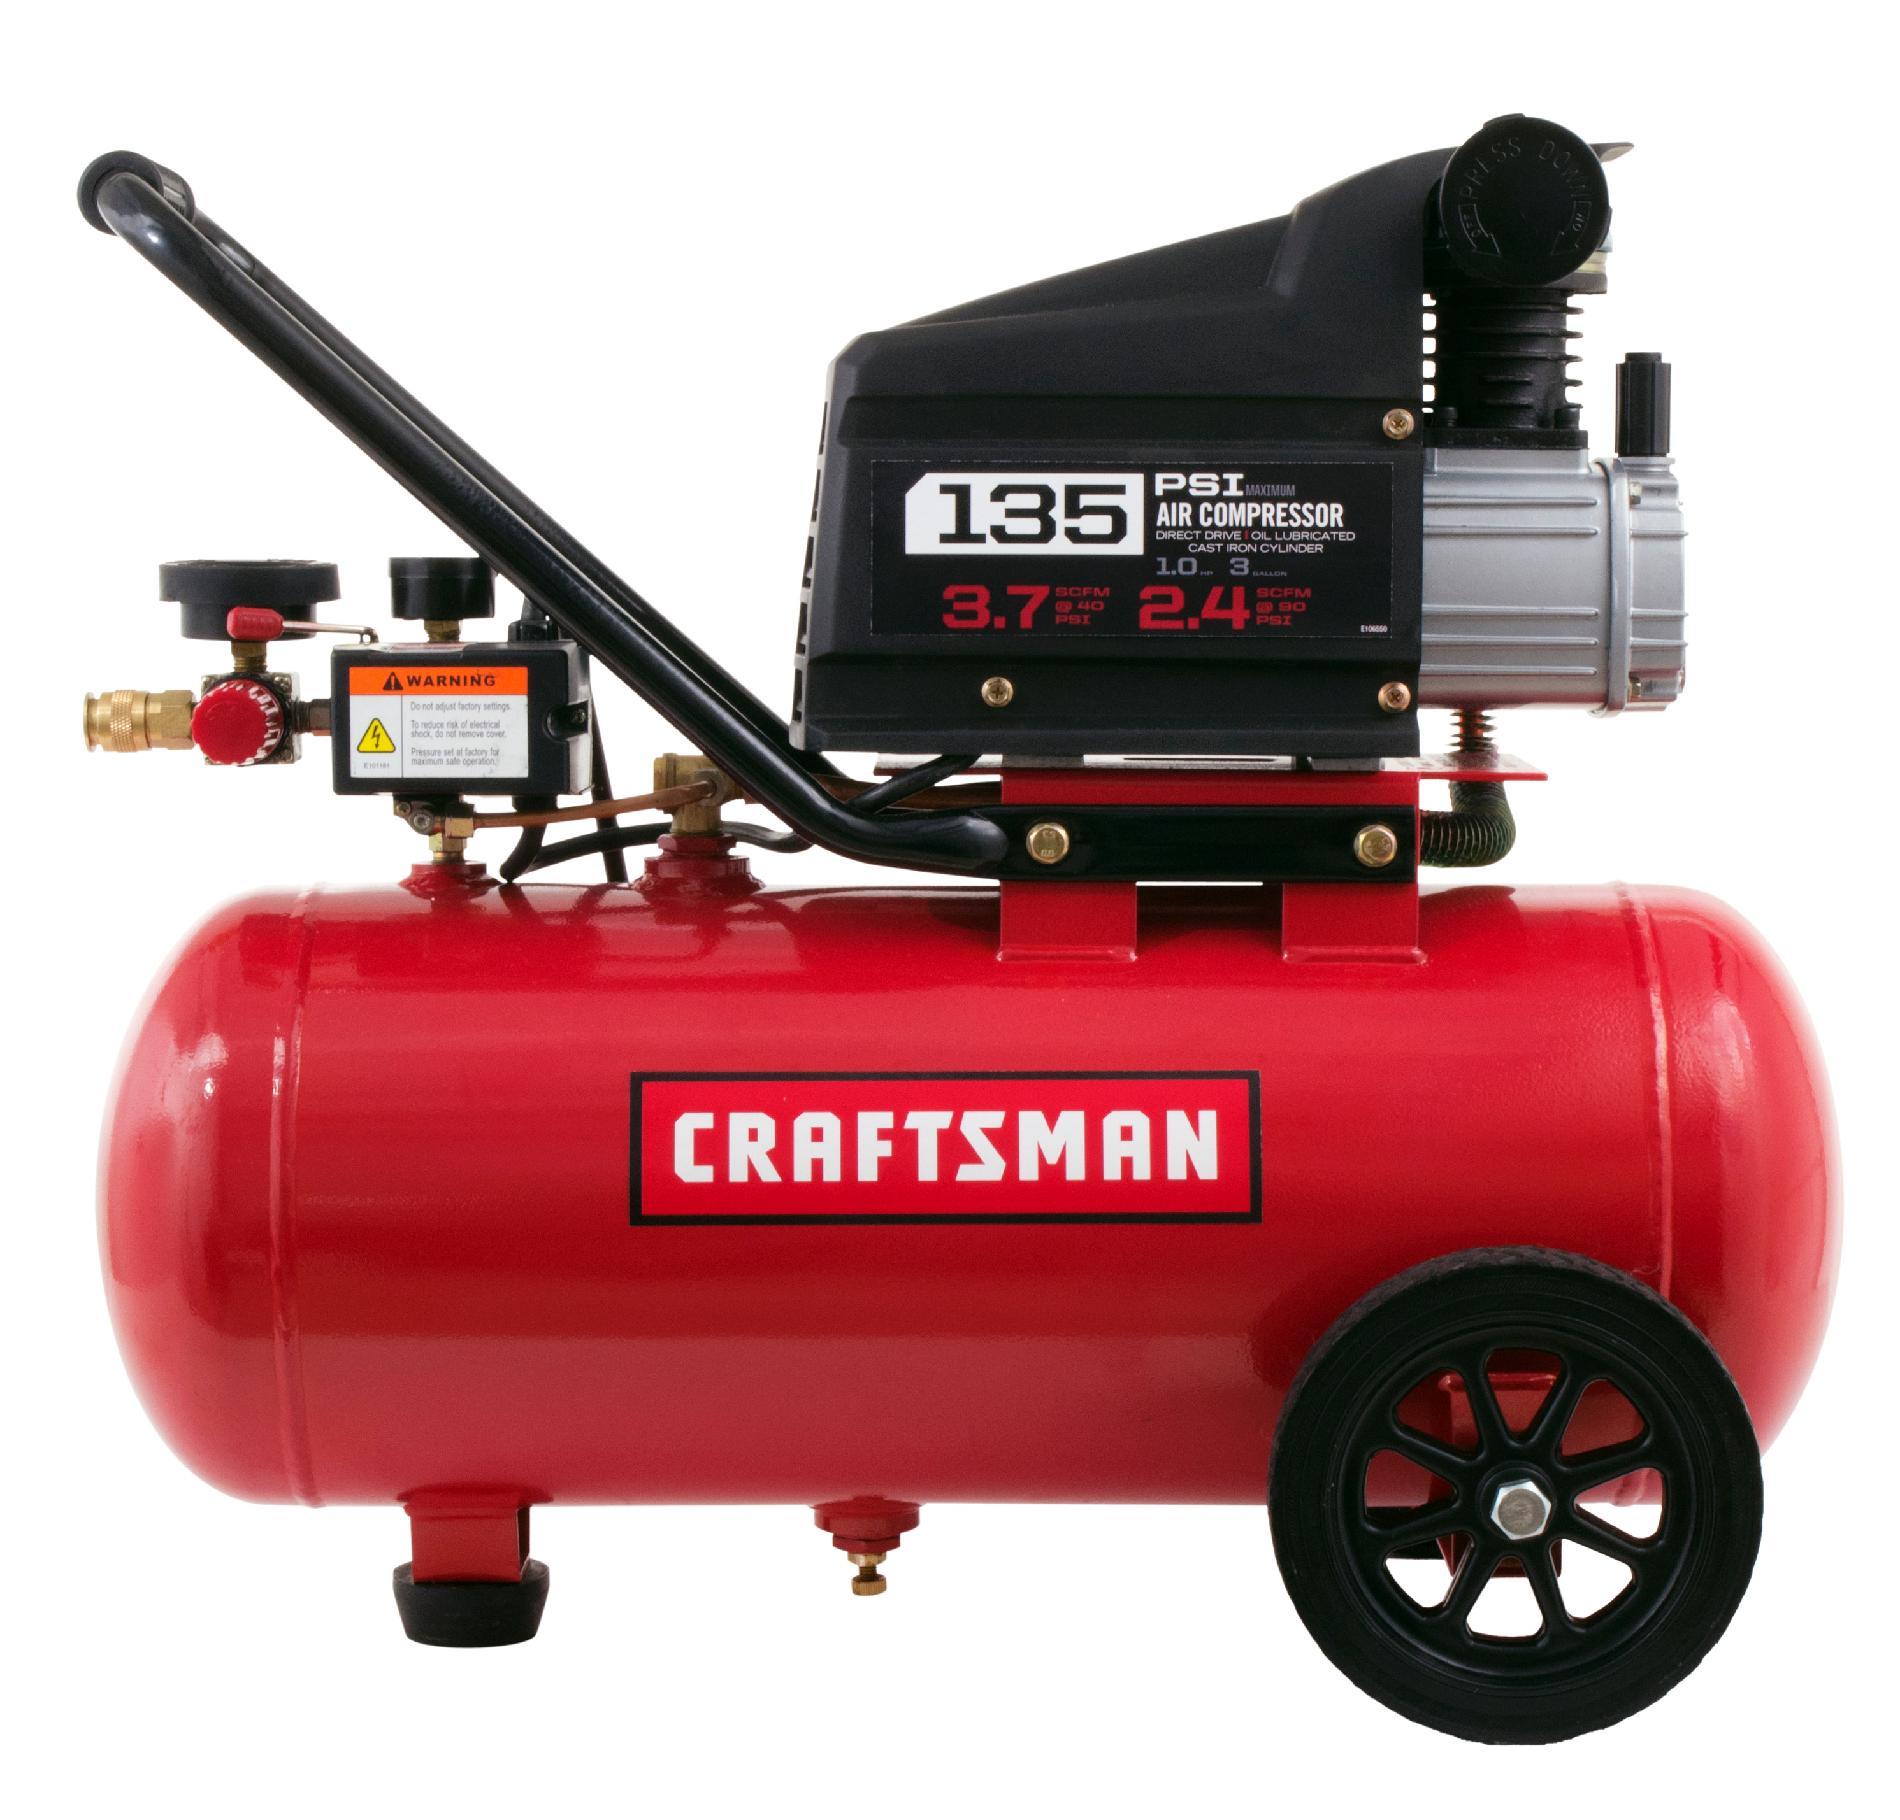 Craftsman 7 Gallon 1.0 Hp Horizontal Air Compressor 135